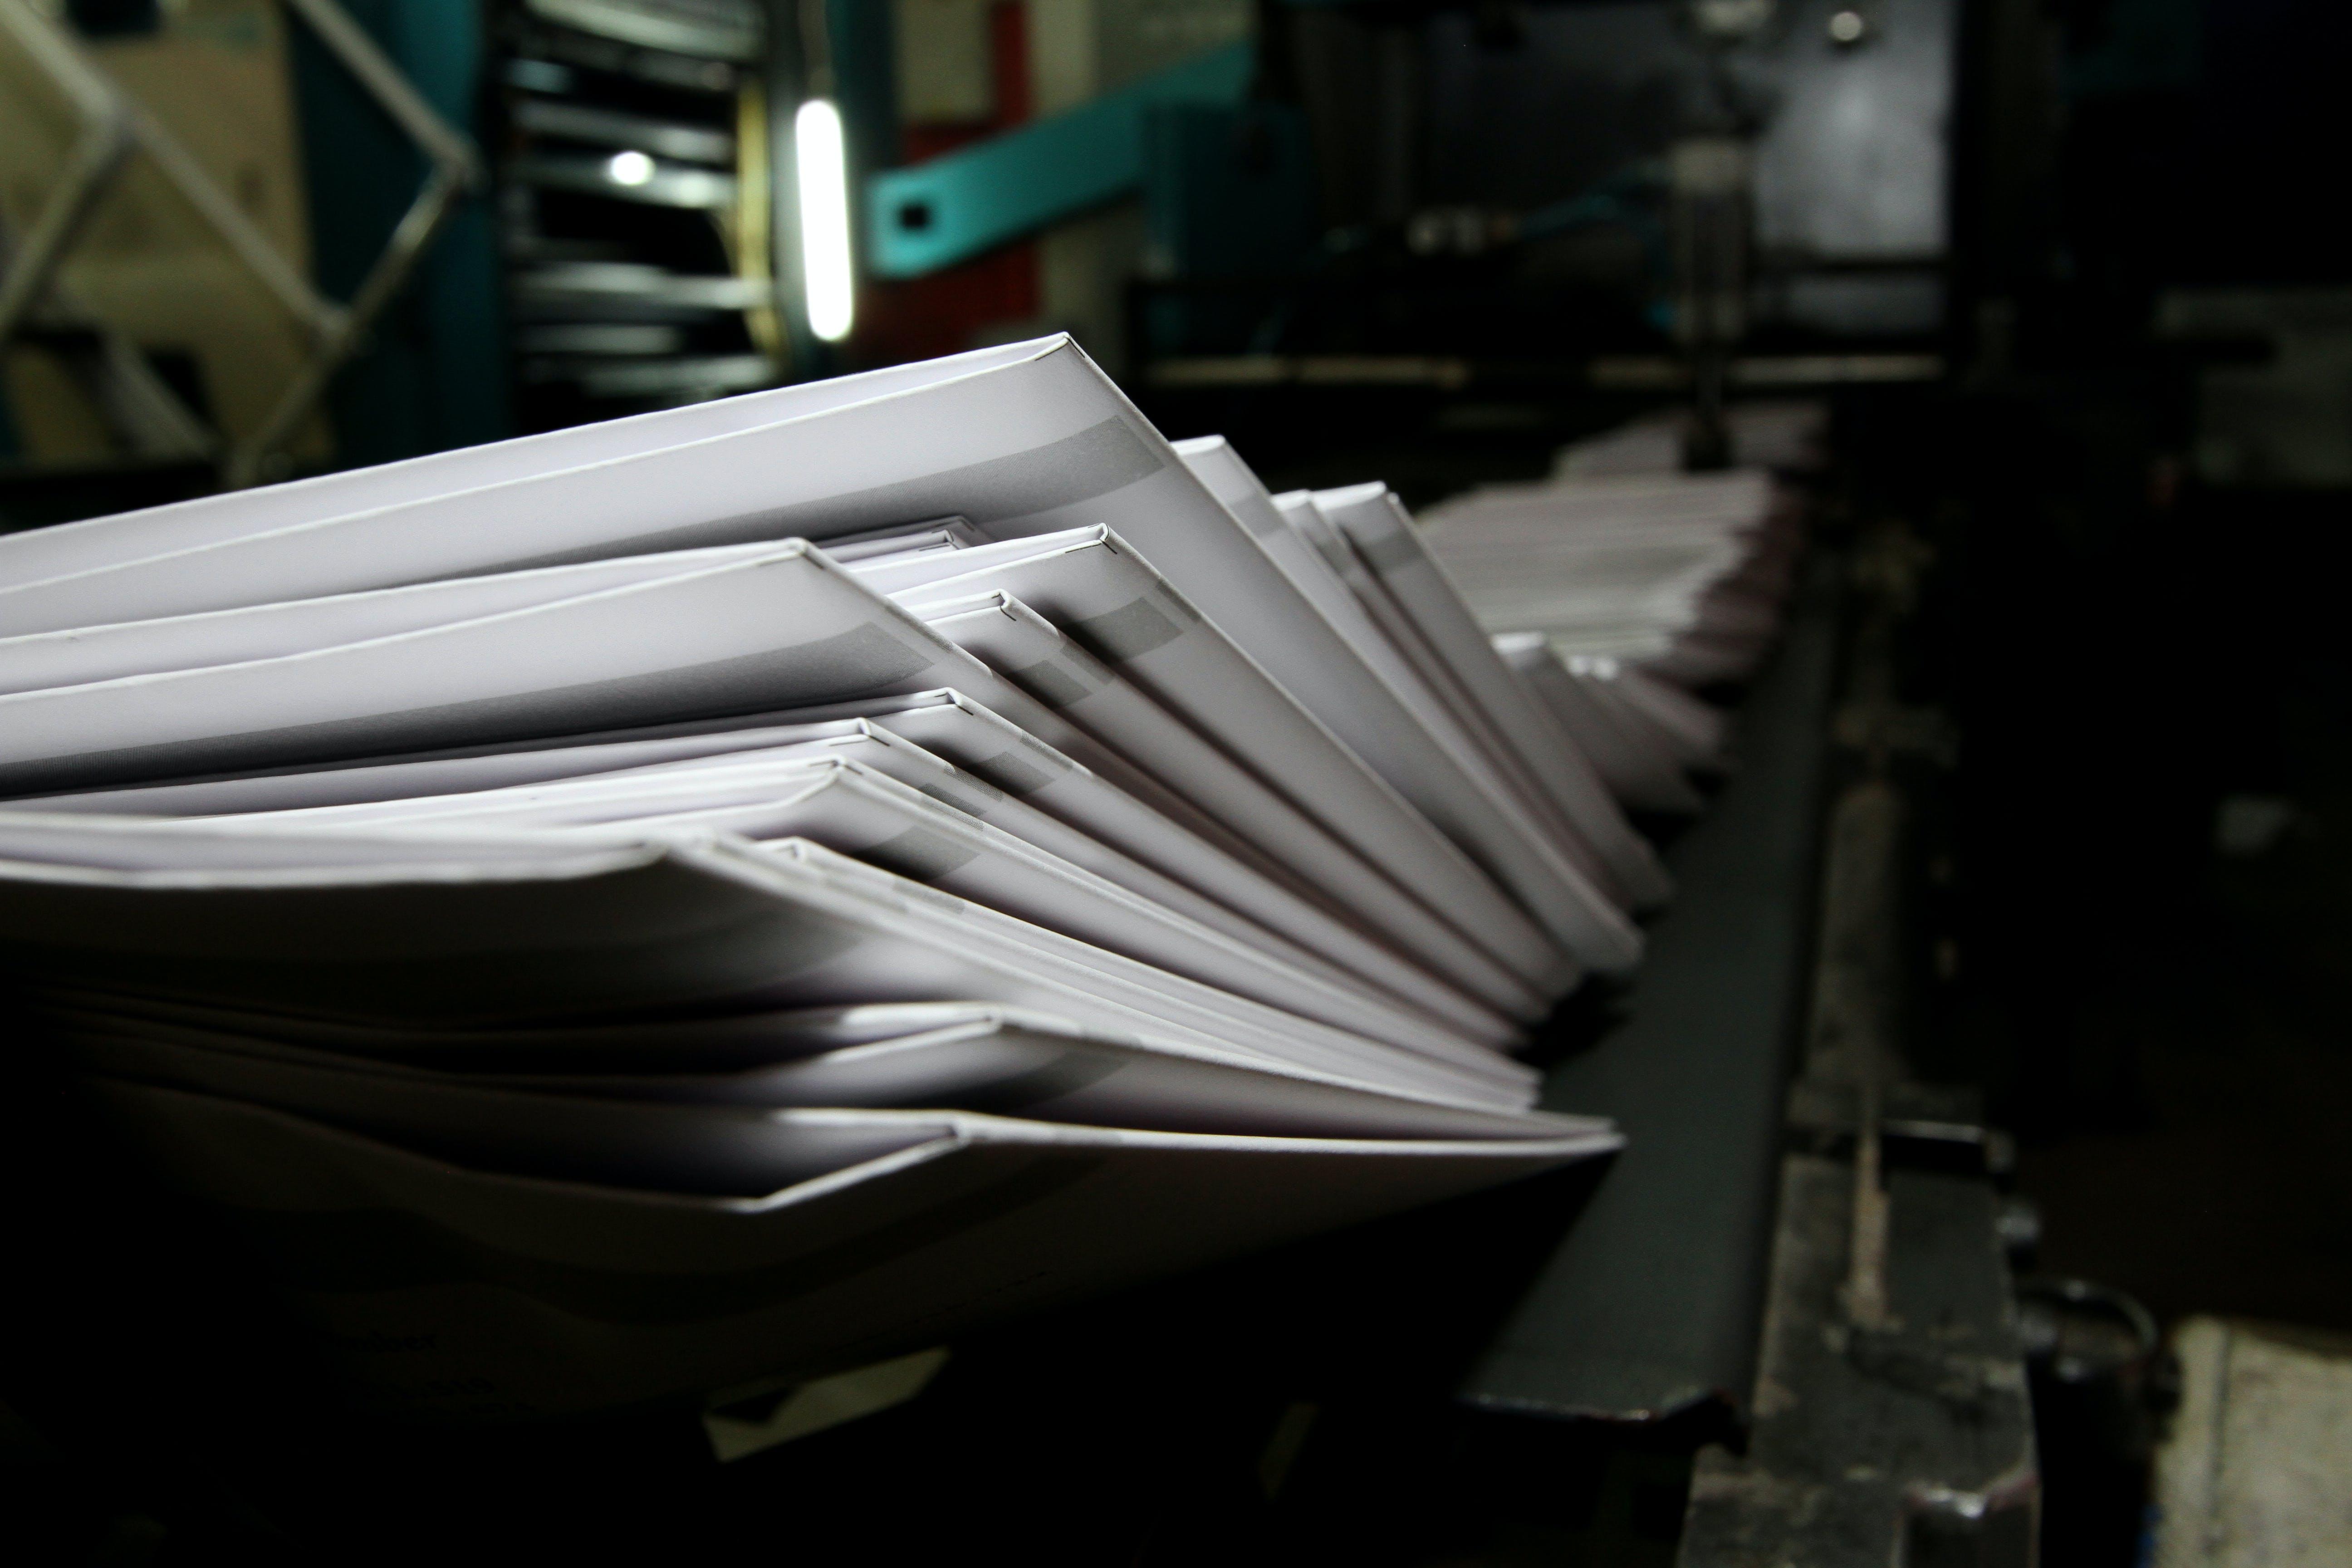 Free stock photo of book, Book printing, printer, Printing press